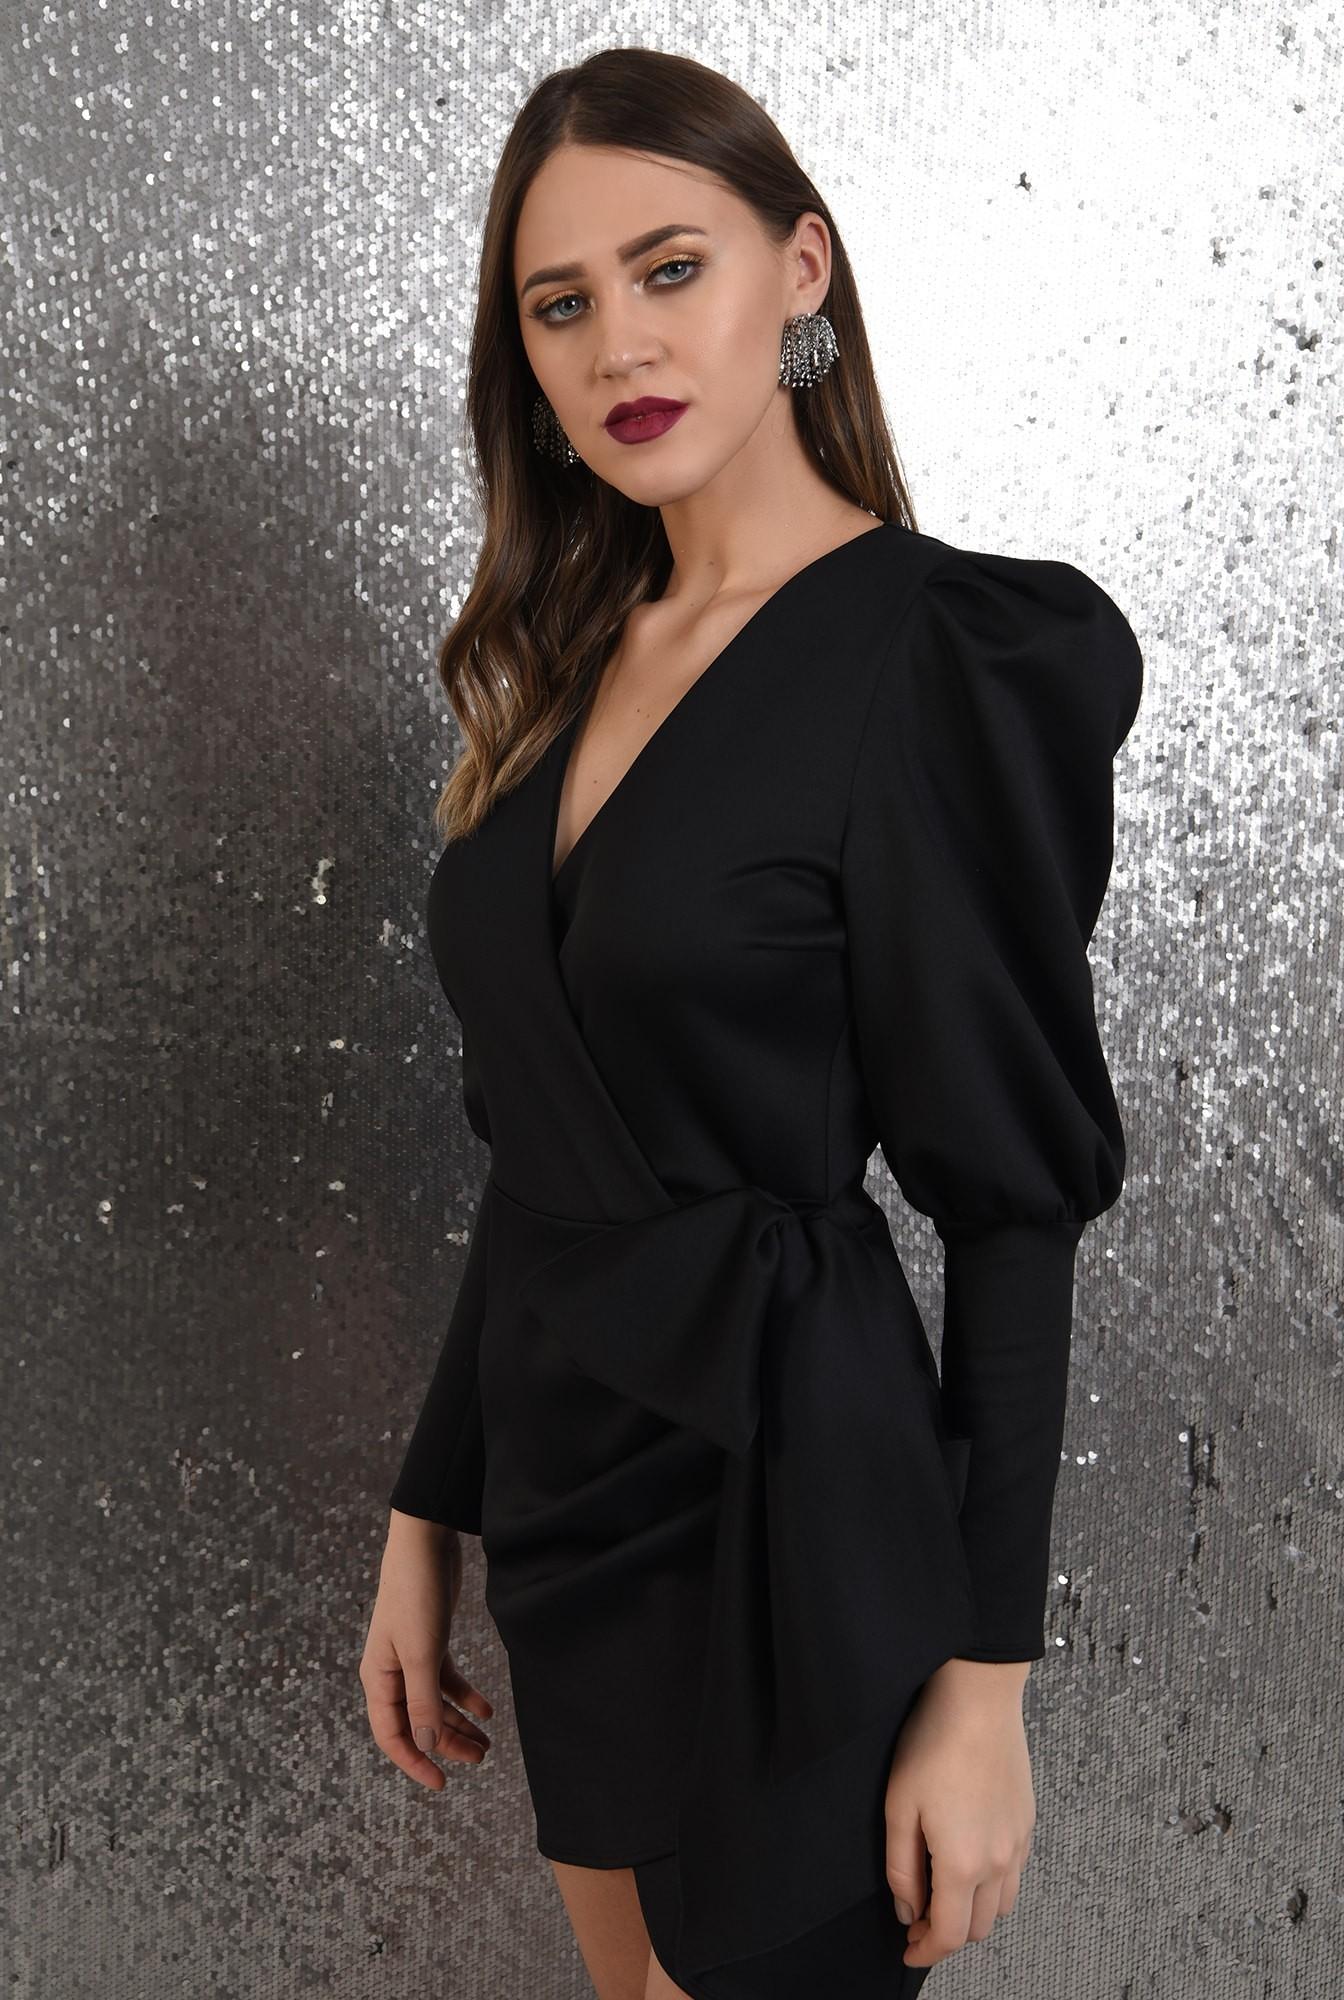 2 - rochie neagra, petrecuta, cu funda, maneci muton, Poema, rochie de seara